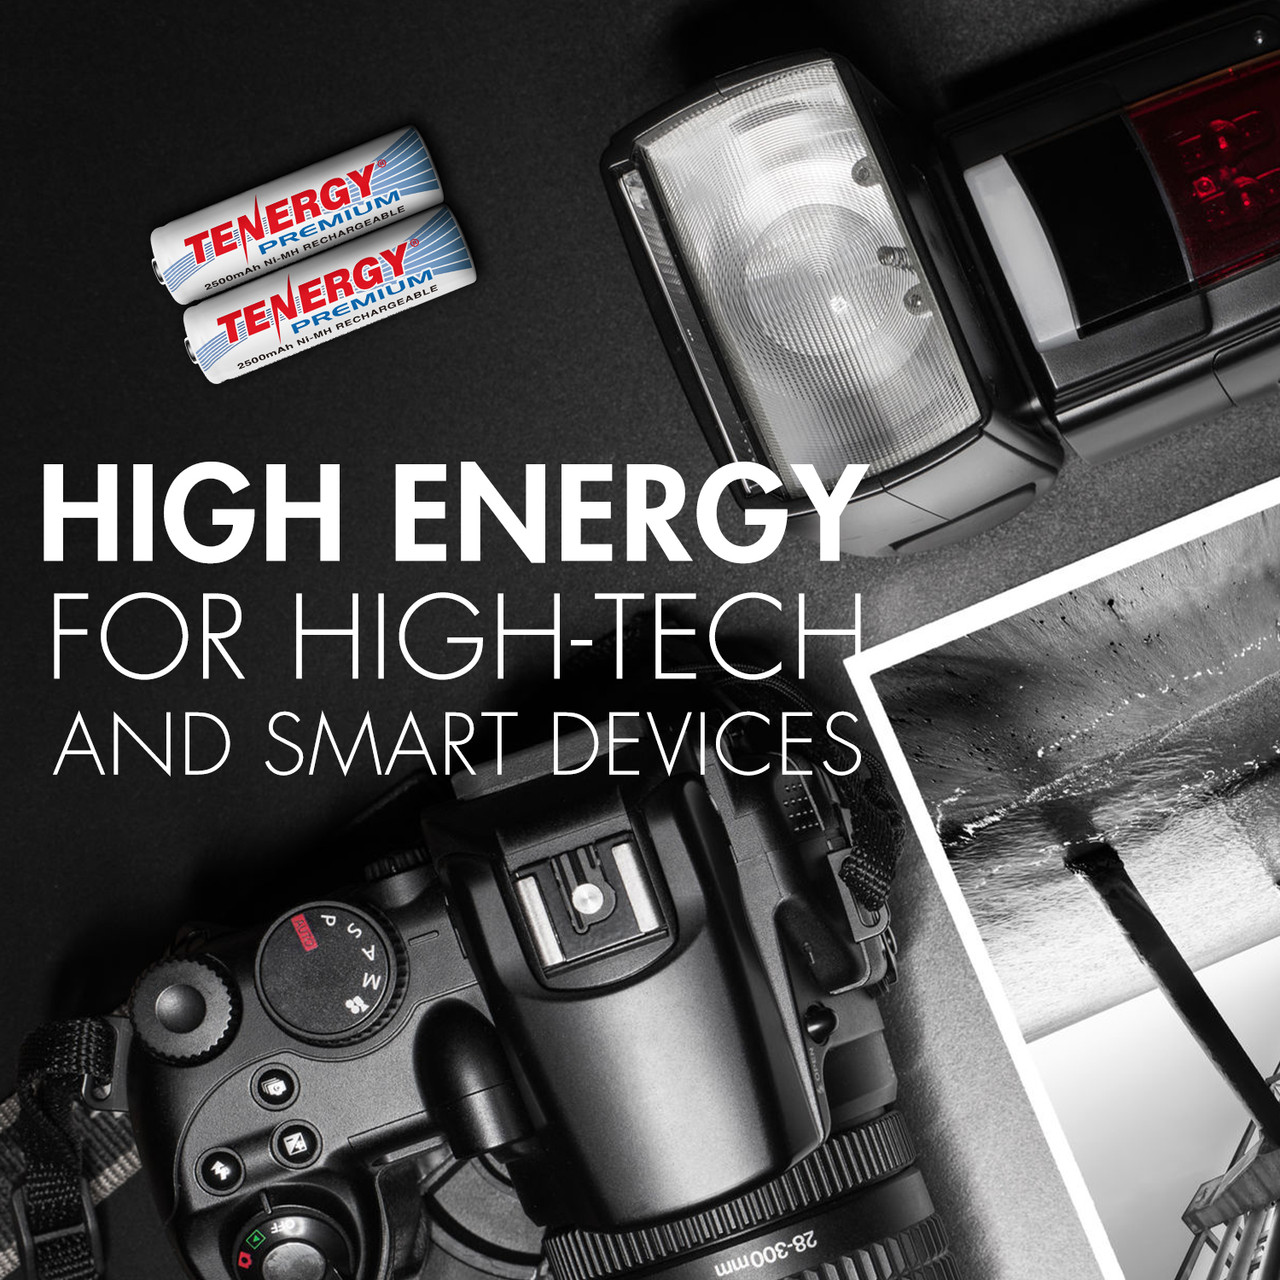 Combo: 24pcs Tenergy Premium NiMH Rechargeable Batteries, (12 AA/8 AAA/4 9V)